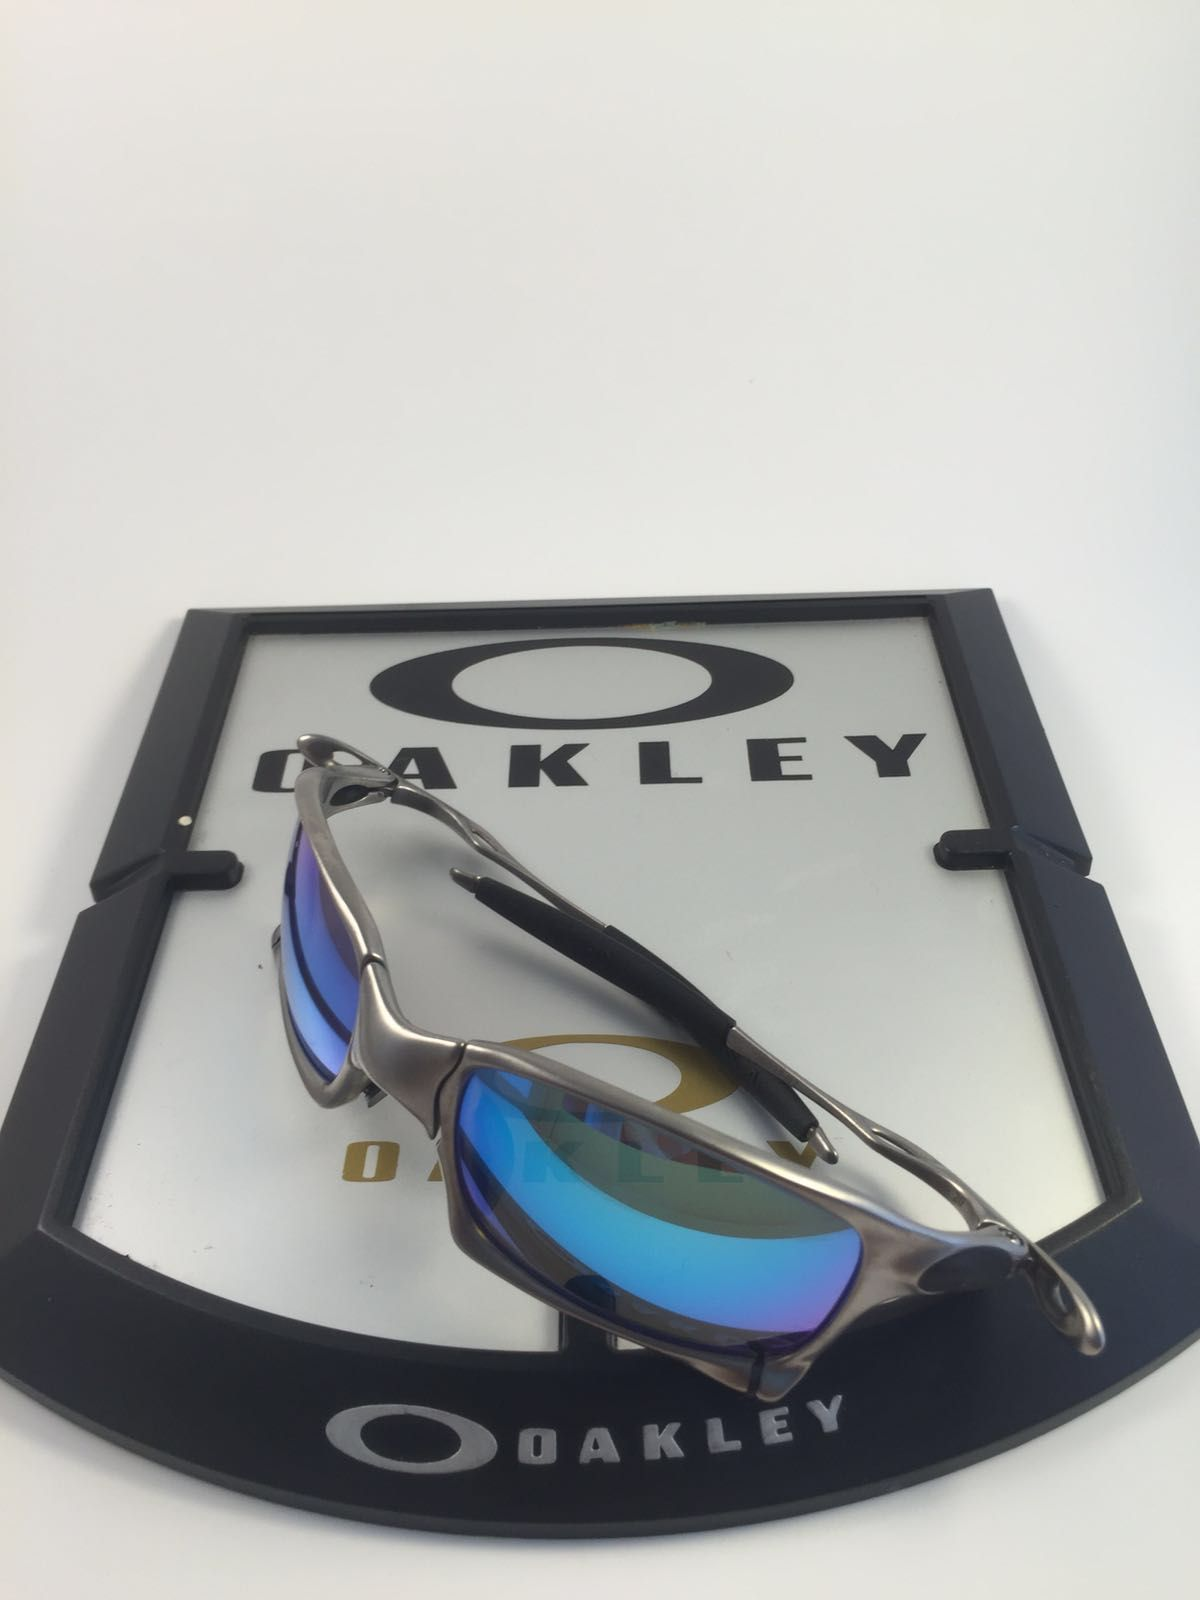 oakley x squared plasma - 6cffbe41-e828-4cbd-94c9-4635a44383f1 (2).jpeg